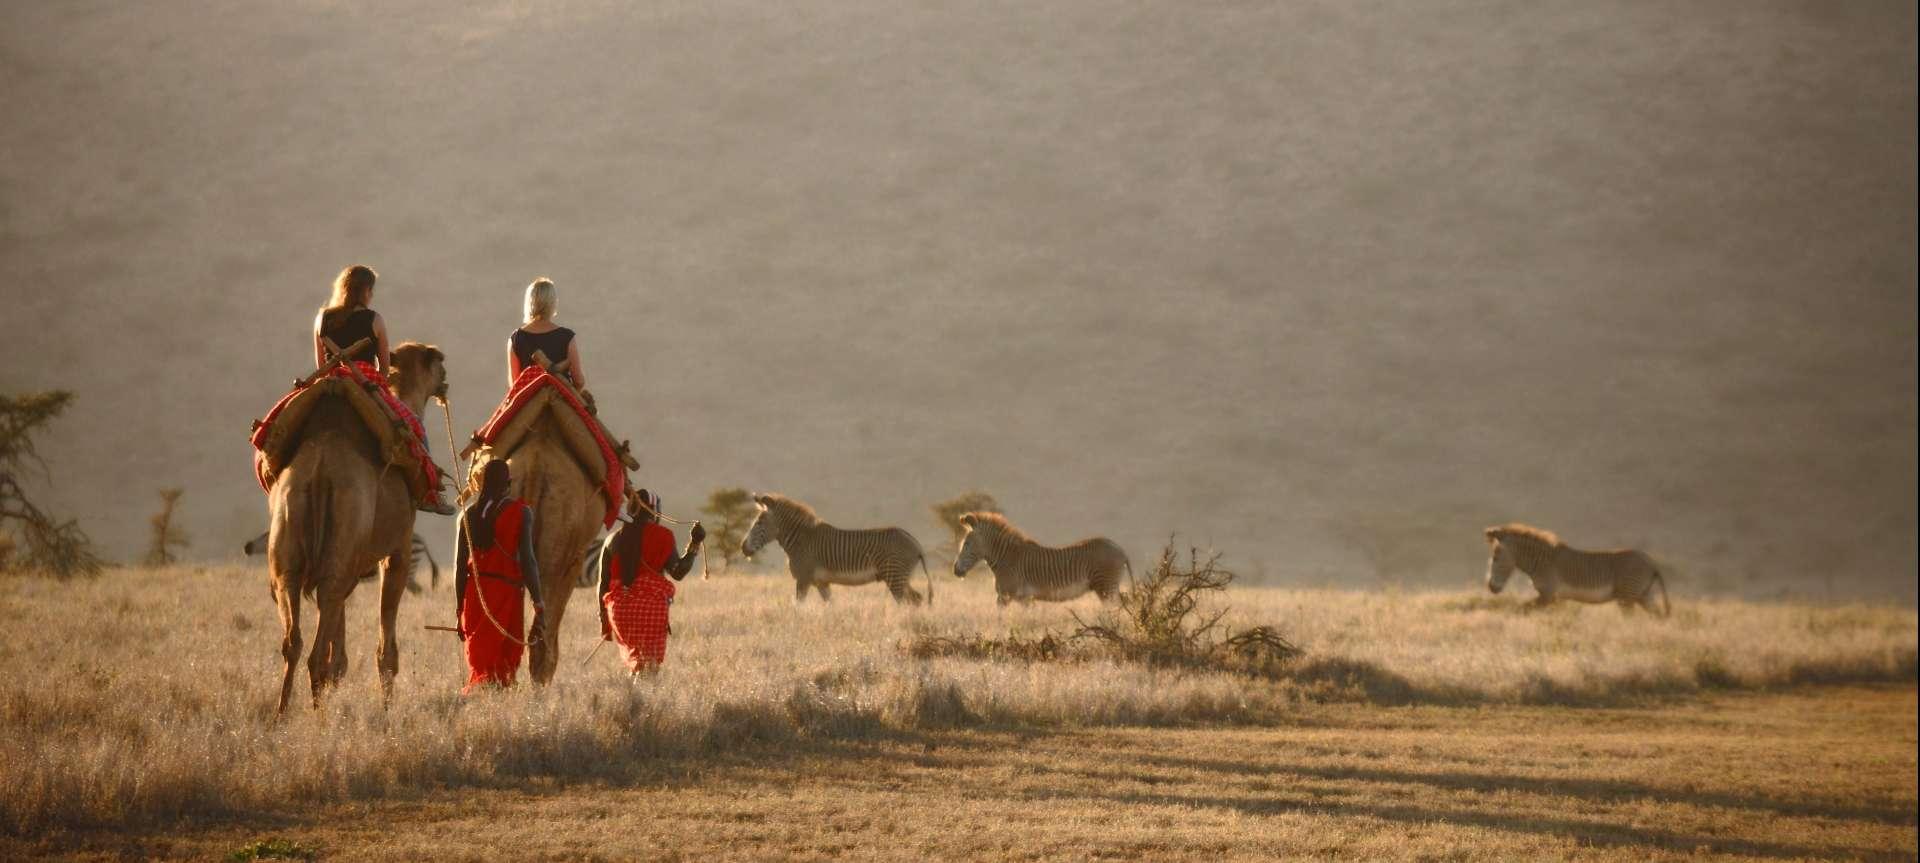 Elewana collection camel safari